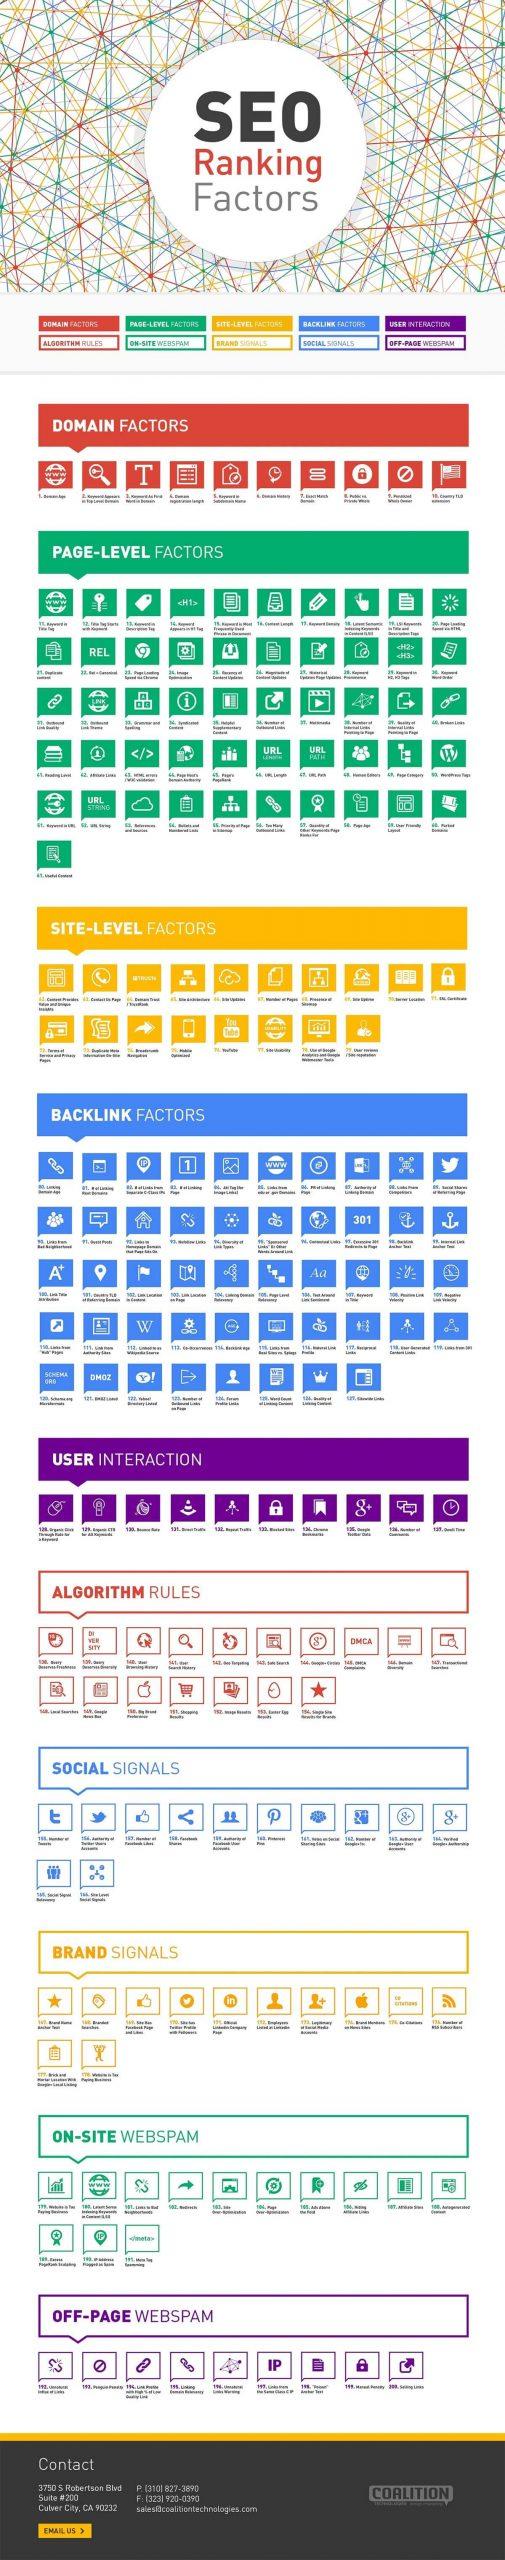 SEO ranking factors infographic compressed